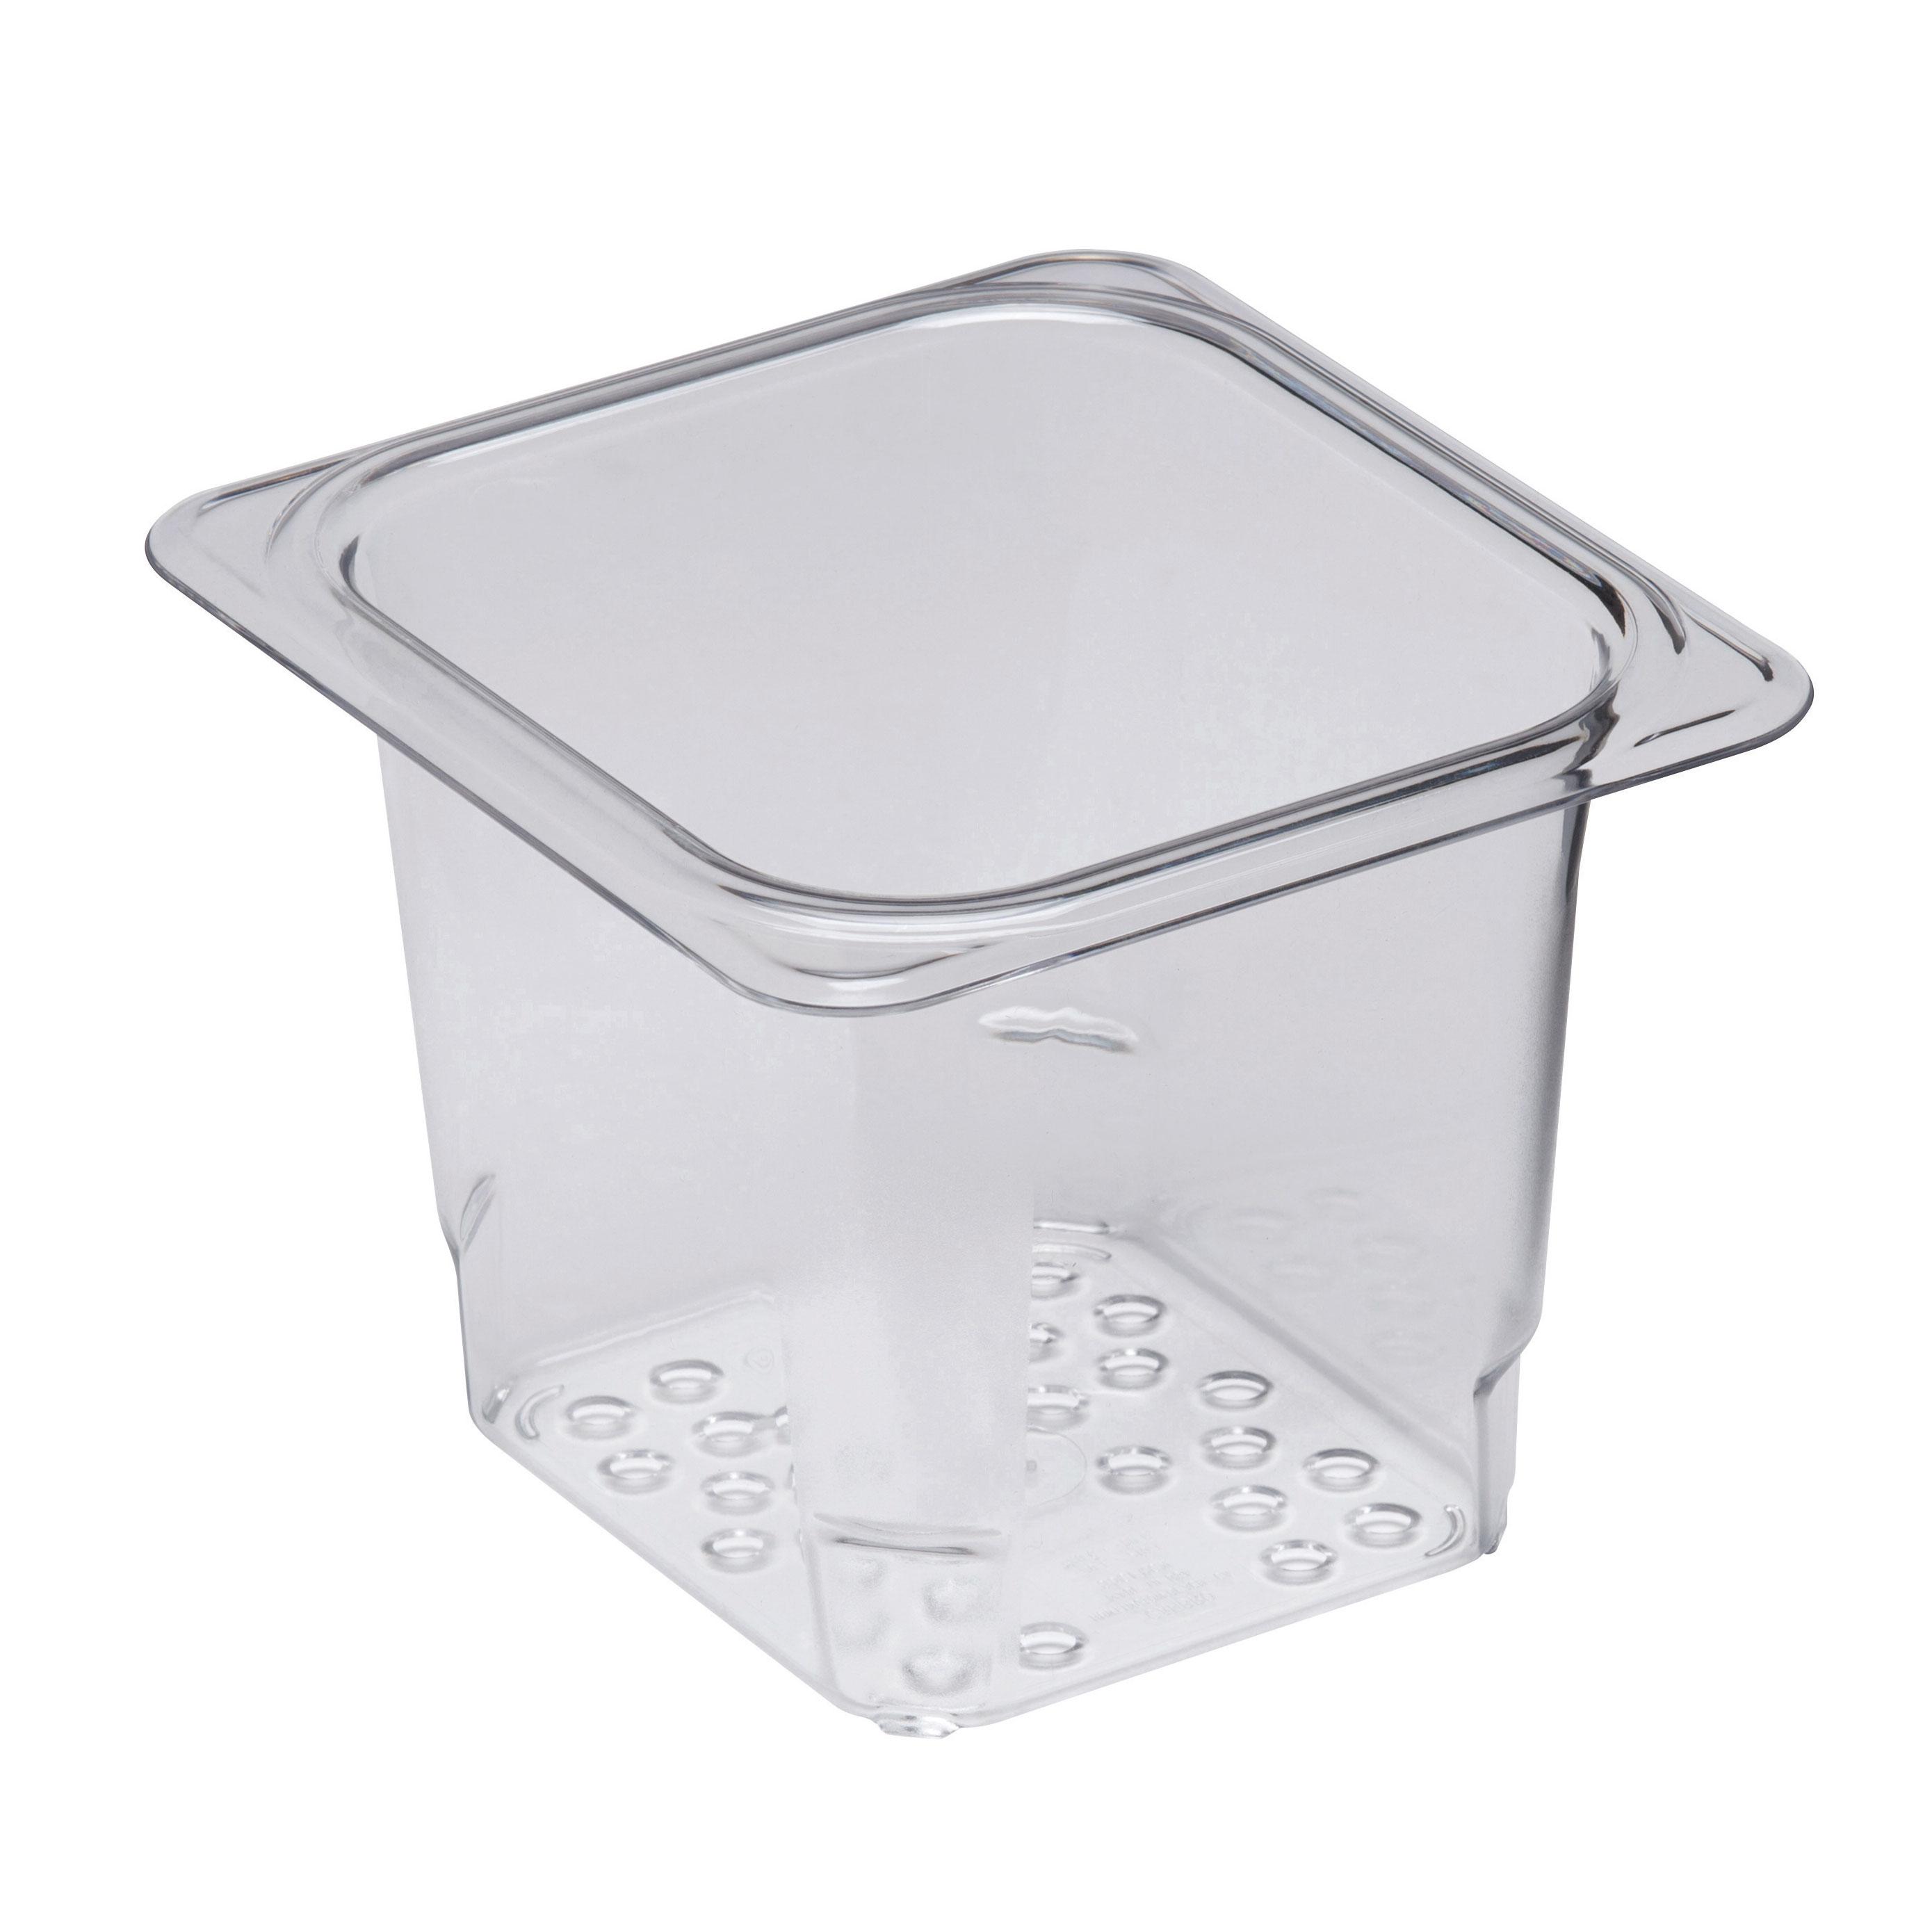 2410-062 Cambro 65CLRCW135 food pan colander